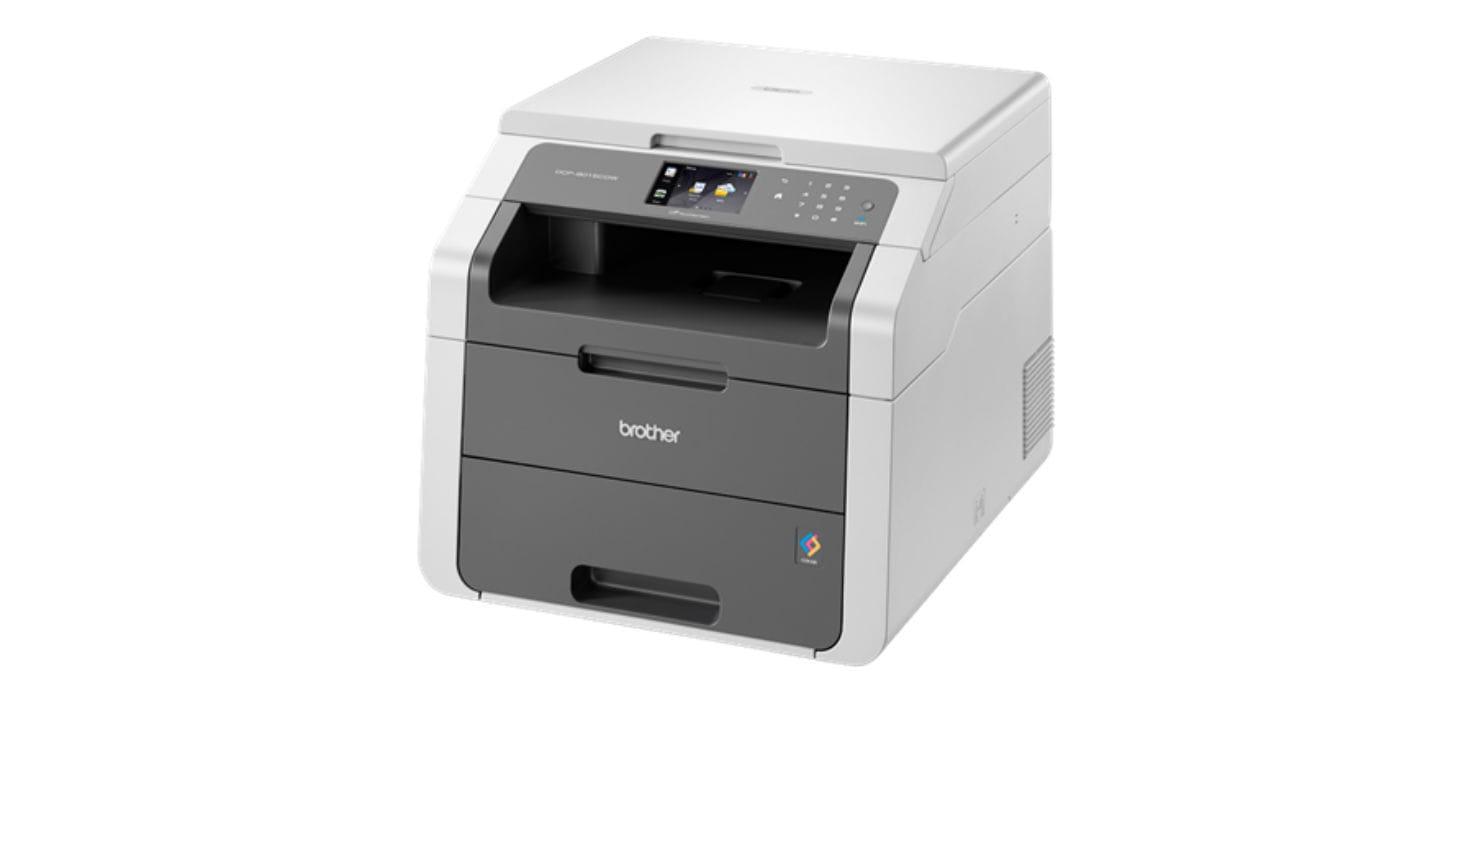 Impressora multifunções laser a cores DCP-9015CDW, Brother